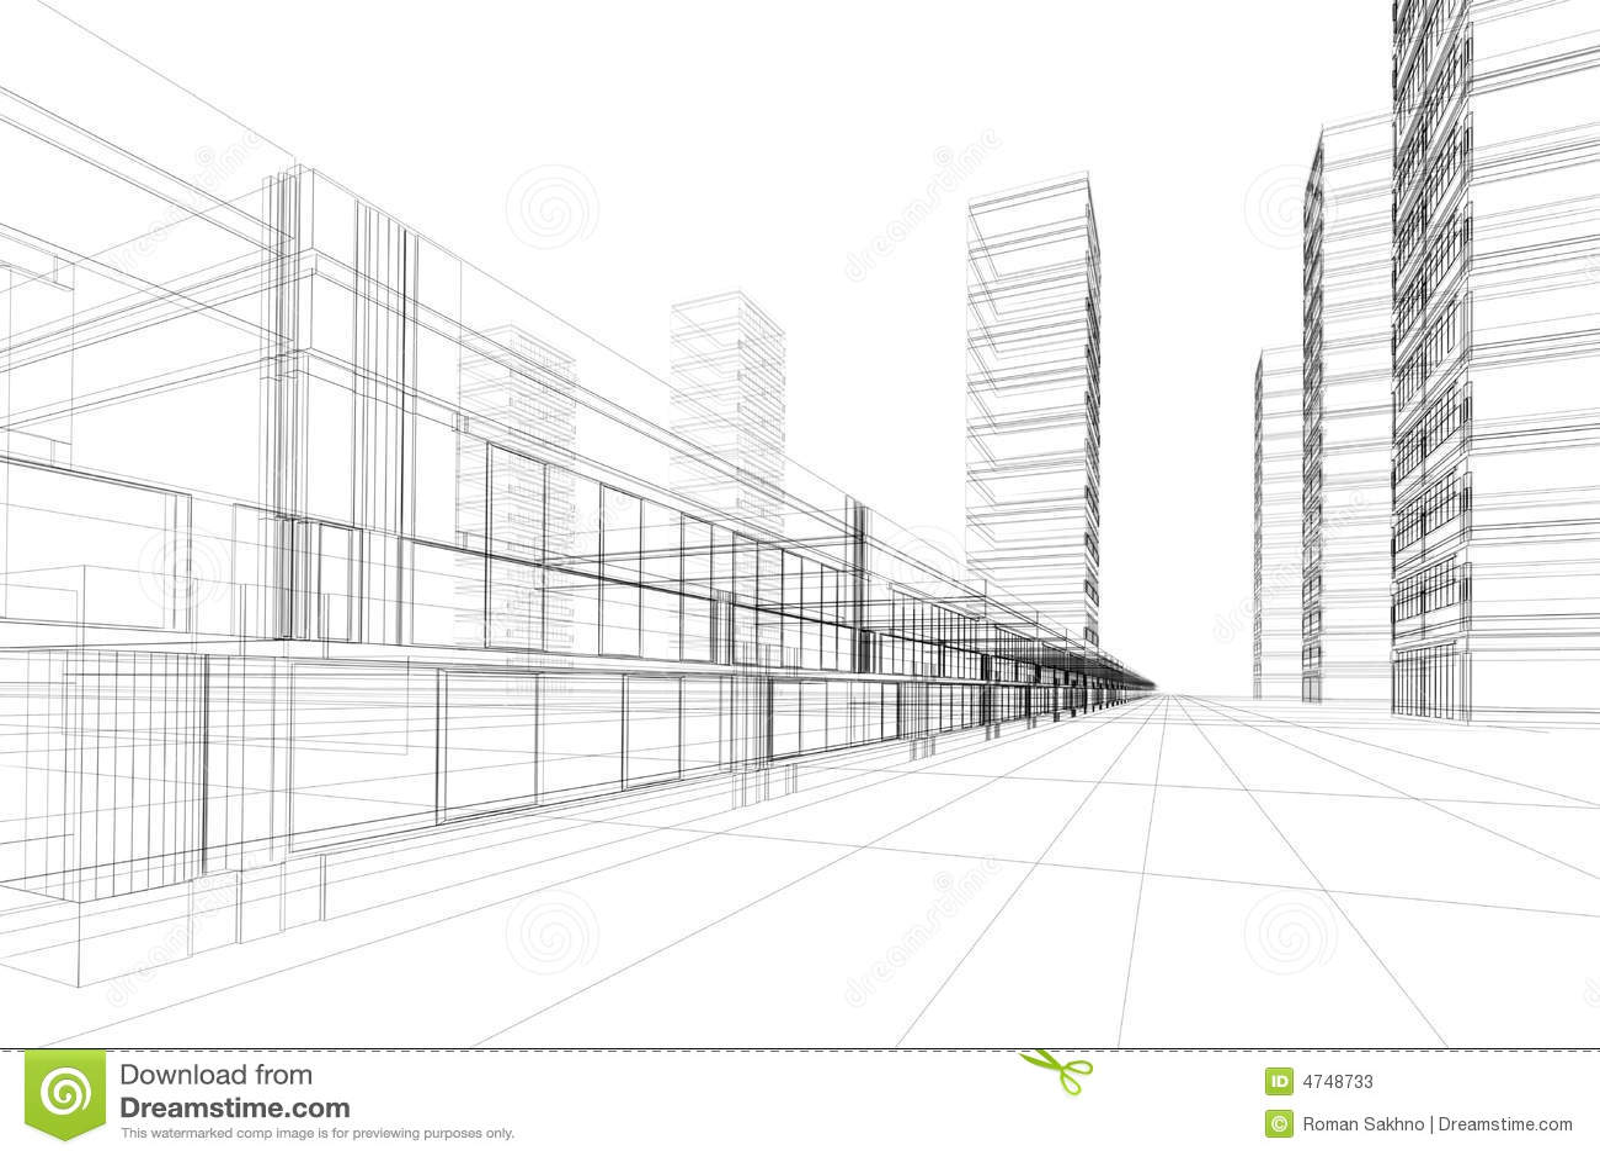 auszug der architektur 3d stockfotos bild 4748733. Black Bedroom Furniture Sets. Home Design Ideas